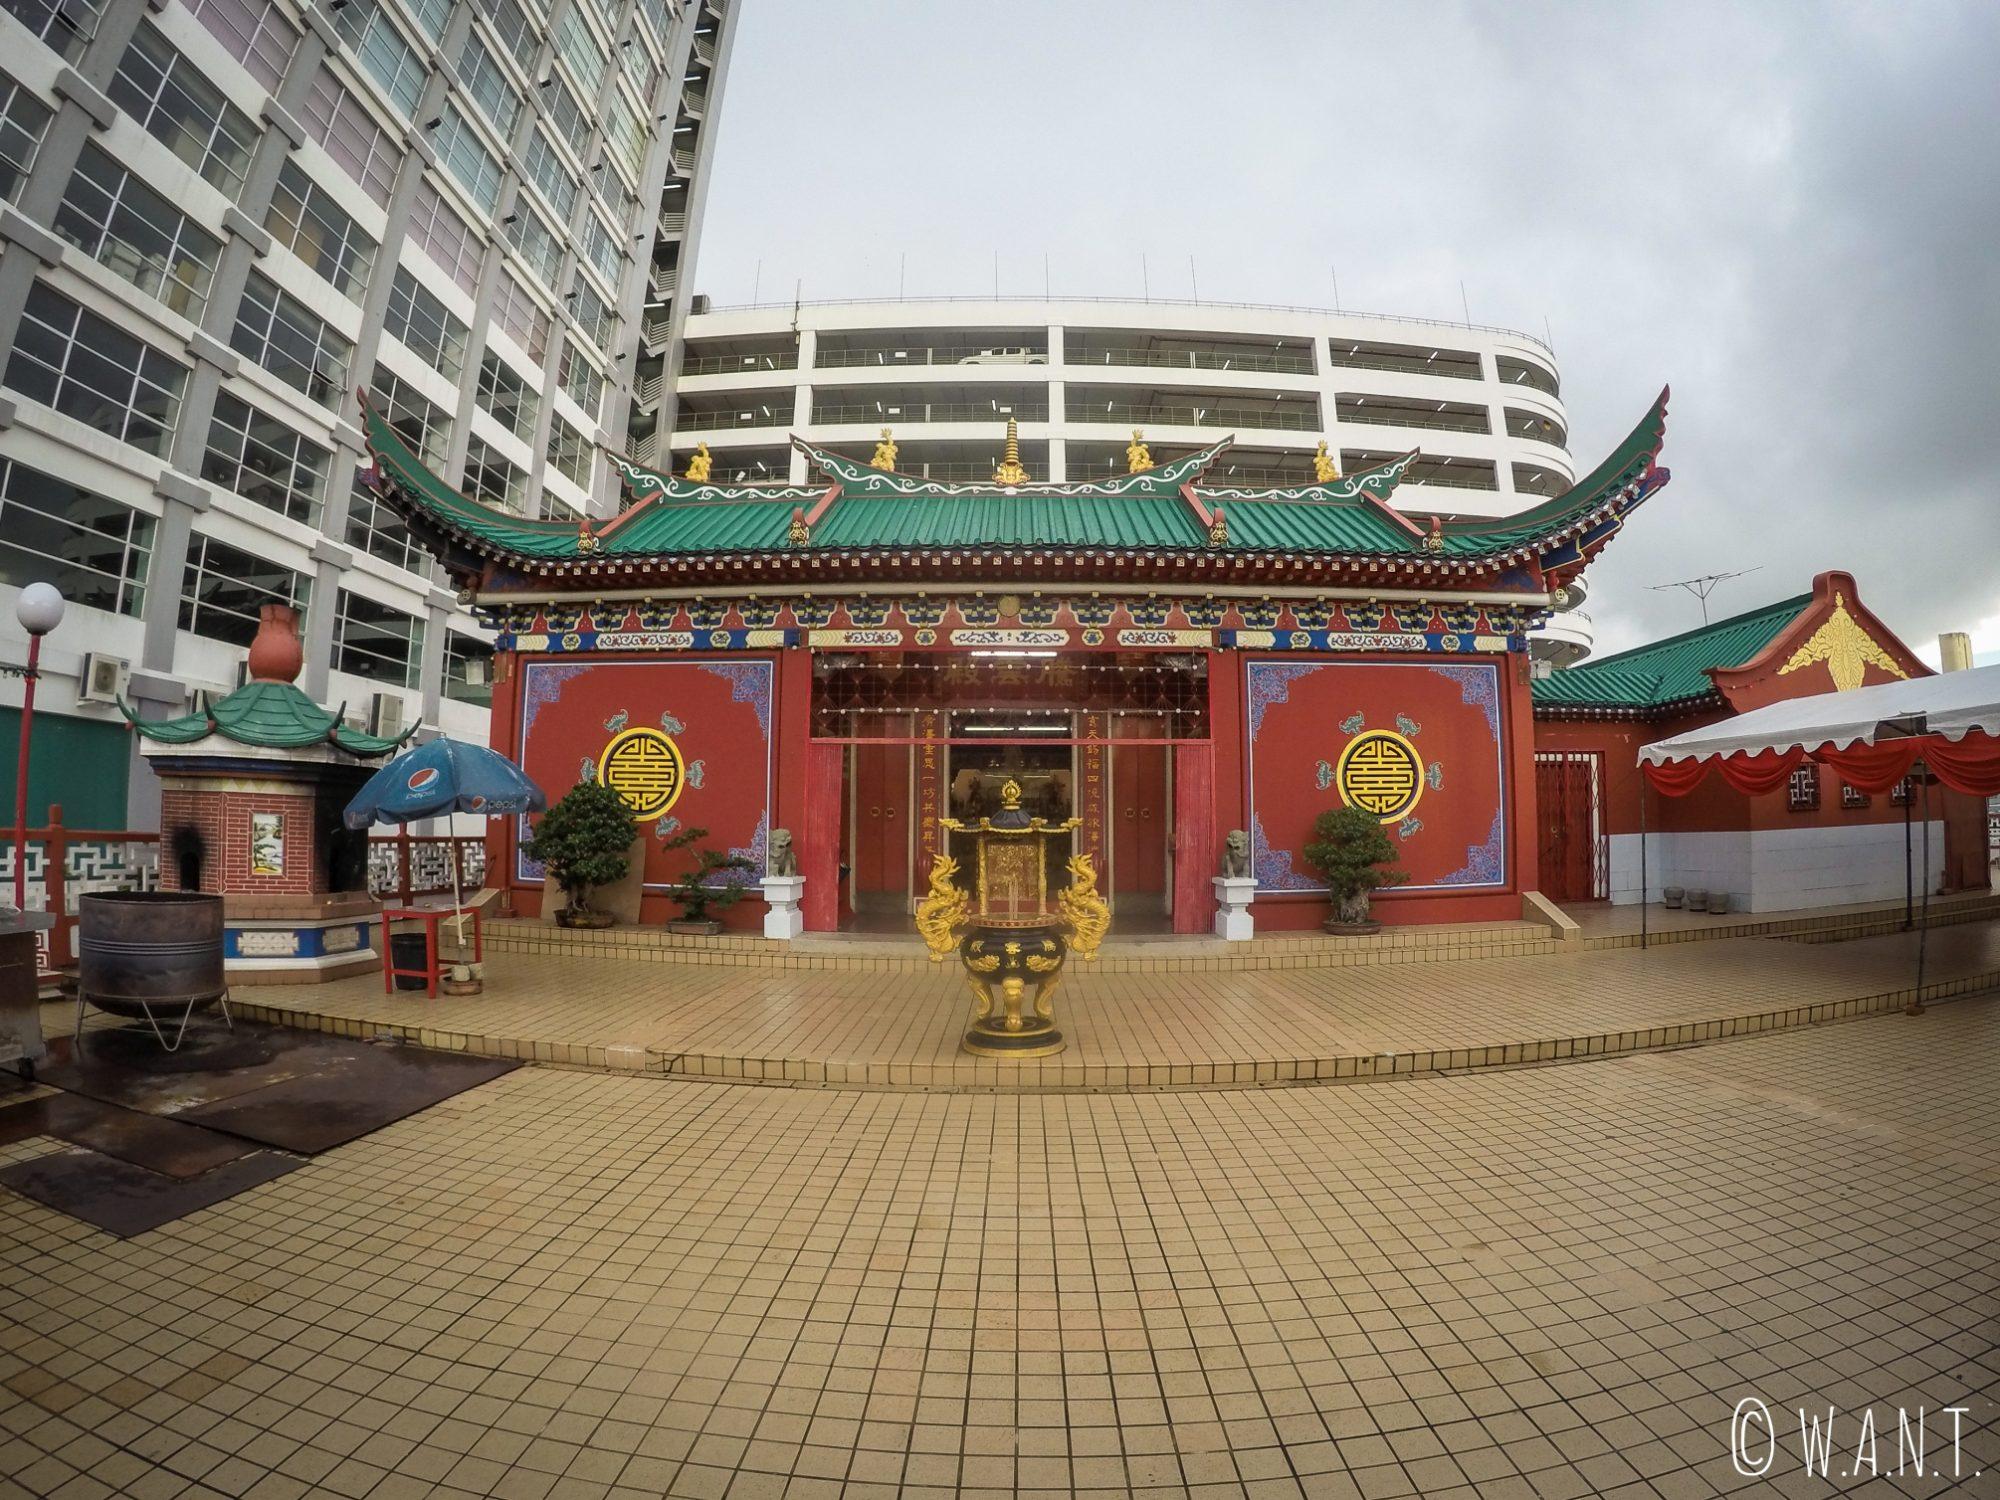 Entrée du Teng Yun Temple de Bandar Seri Begawan